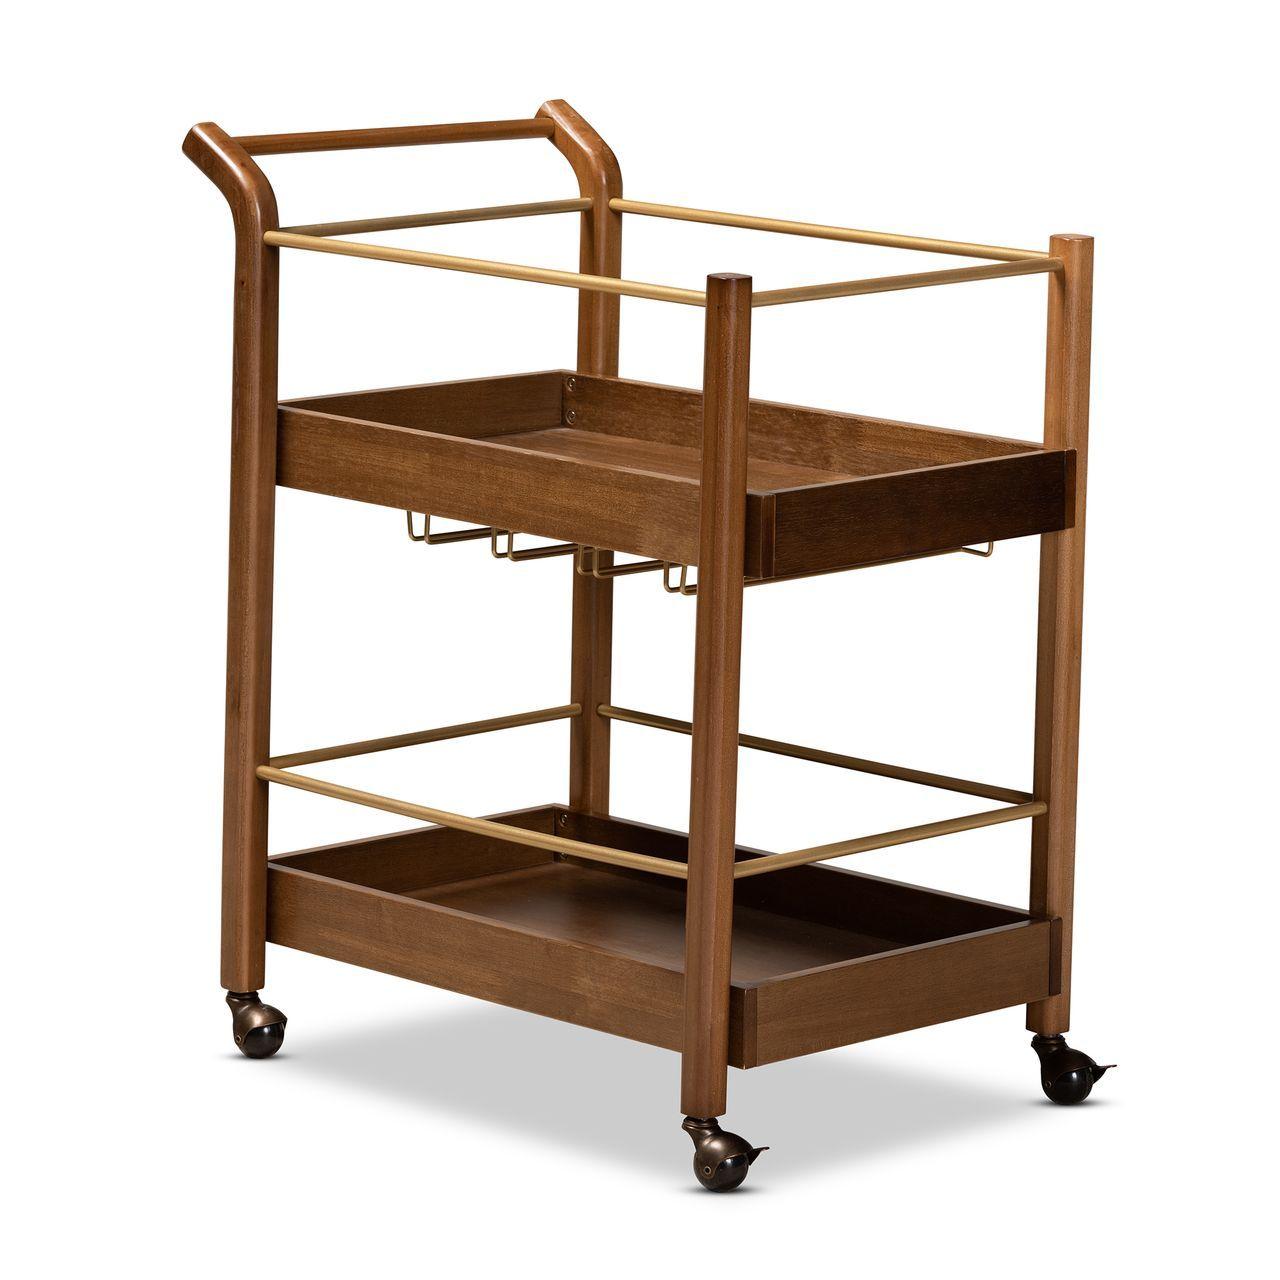 Baxton Studio Tahir Walnut Brown and Gold 2-Tier Mobile Bar Cart